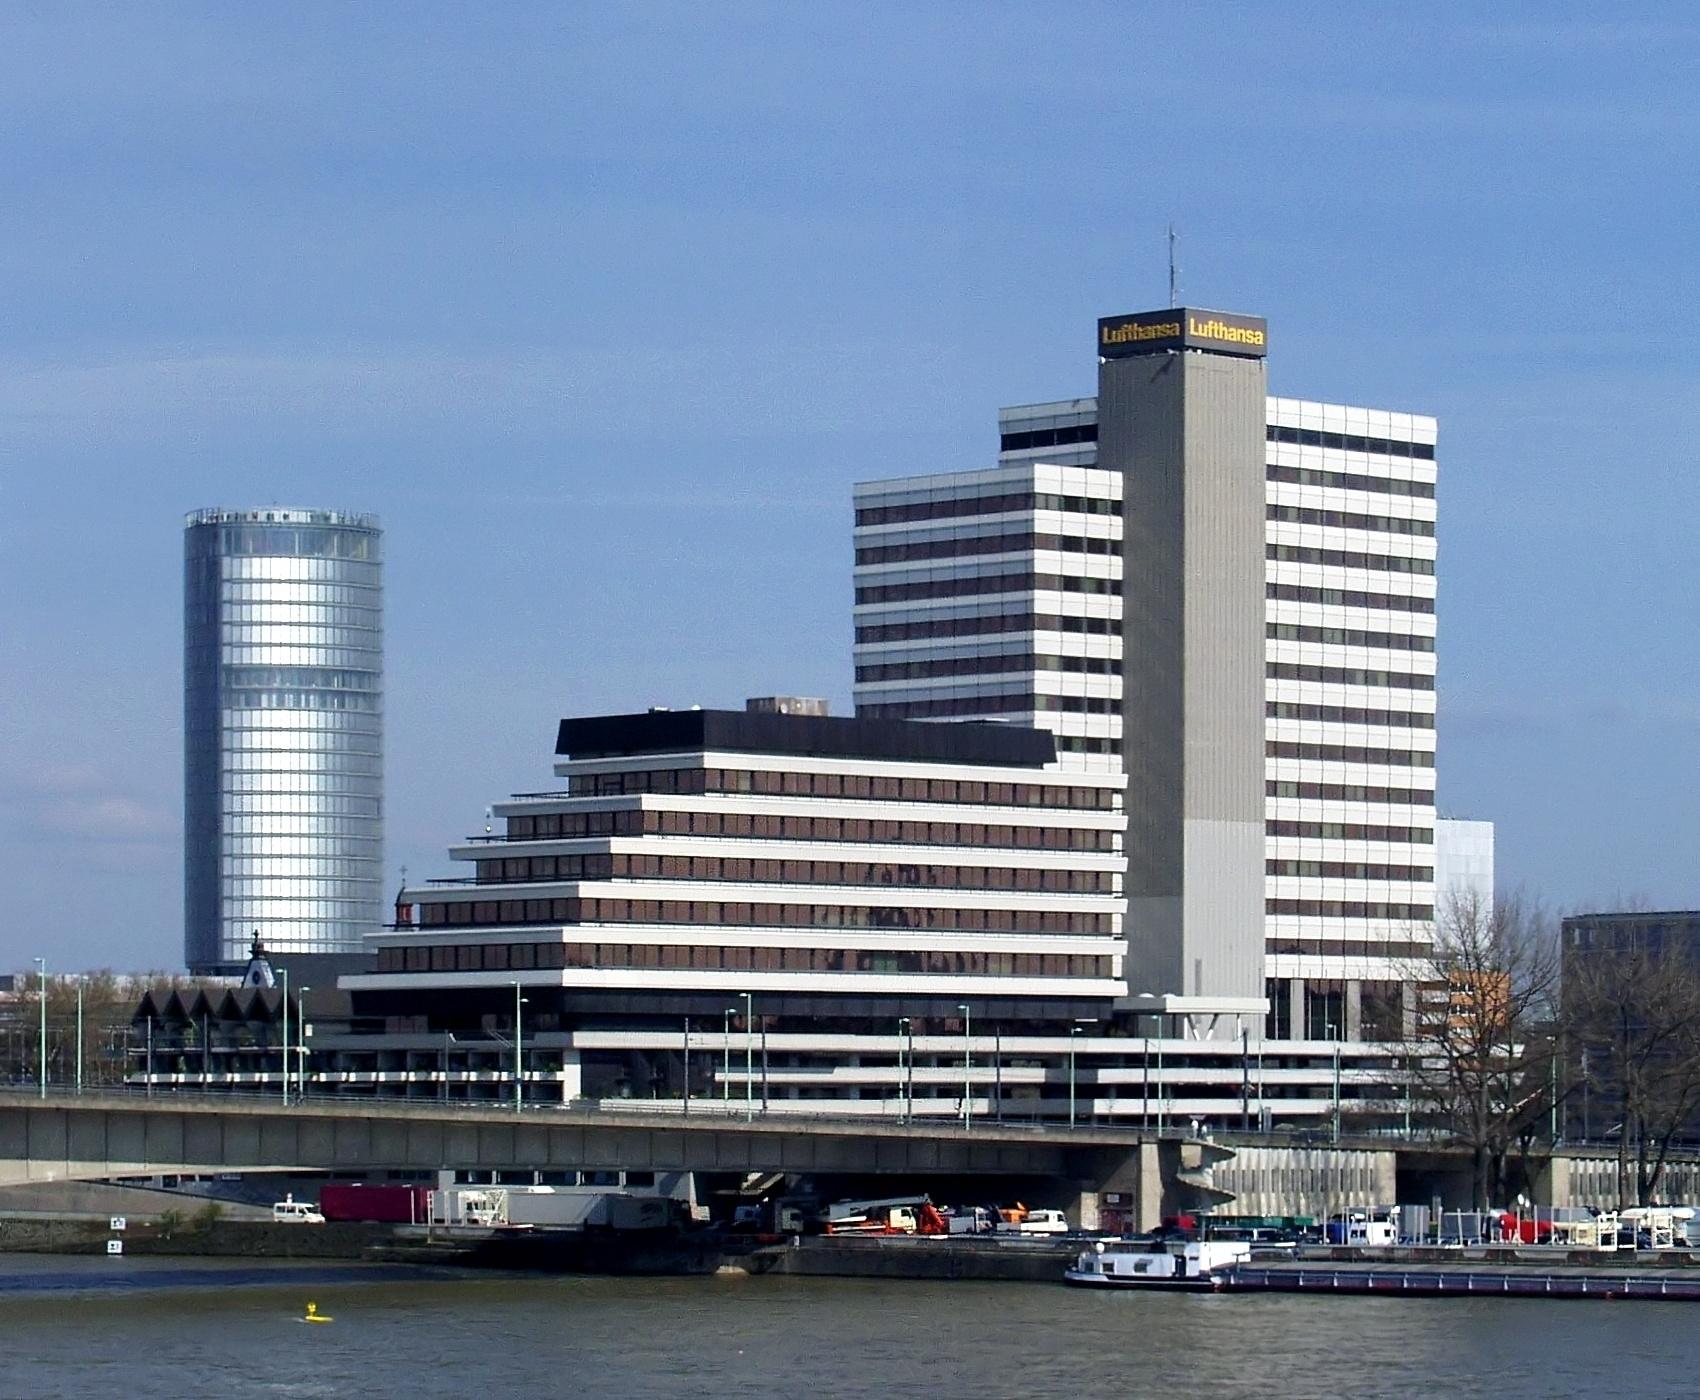 Lufthansa Köln